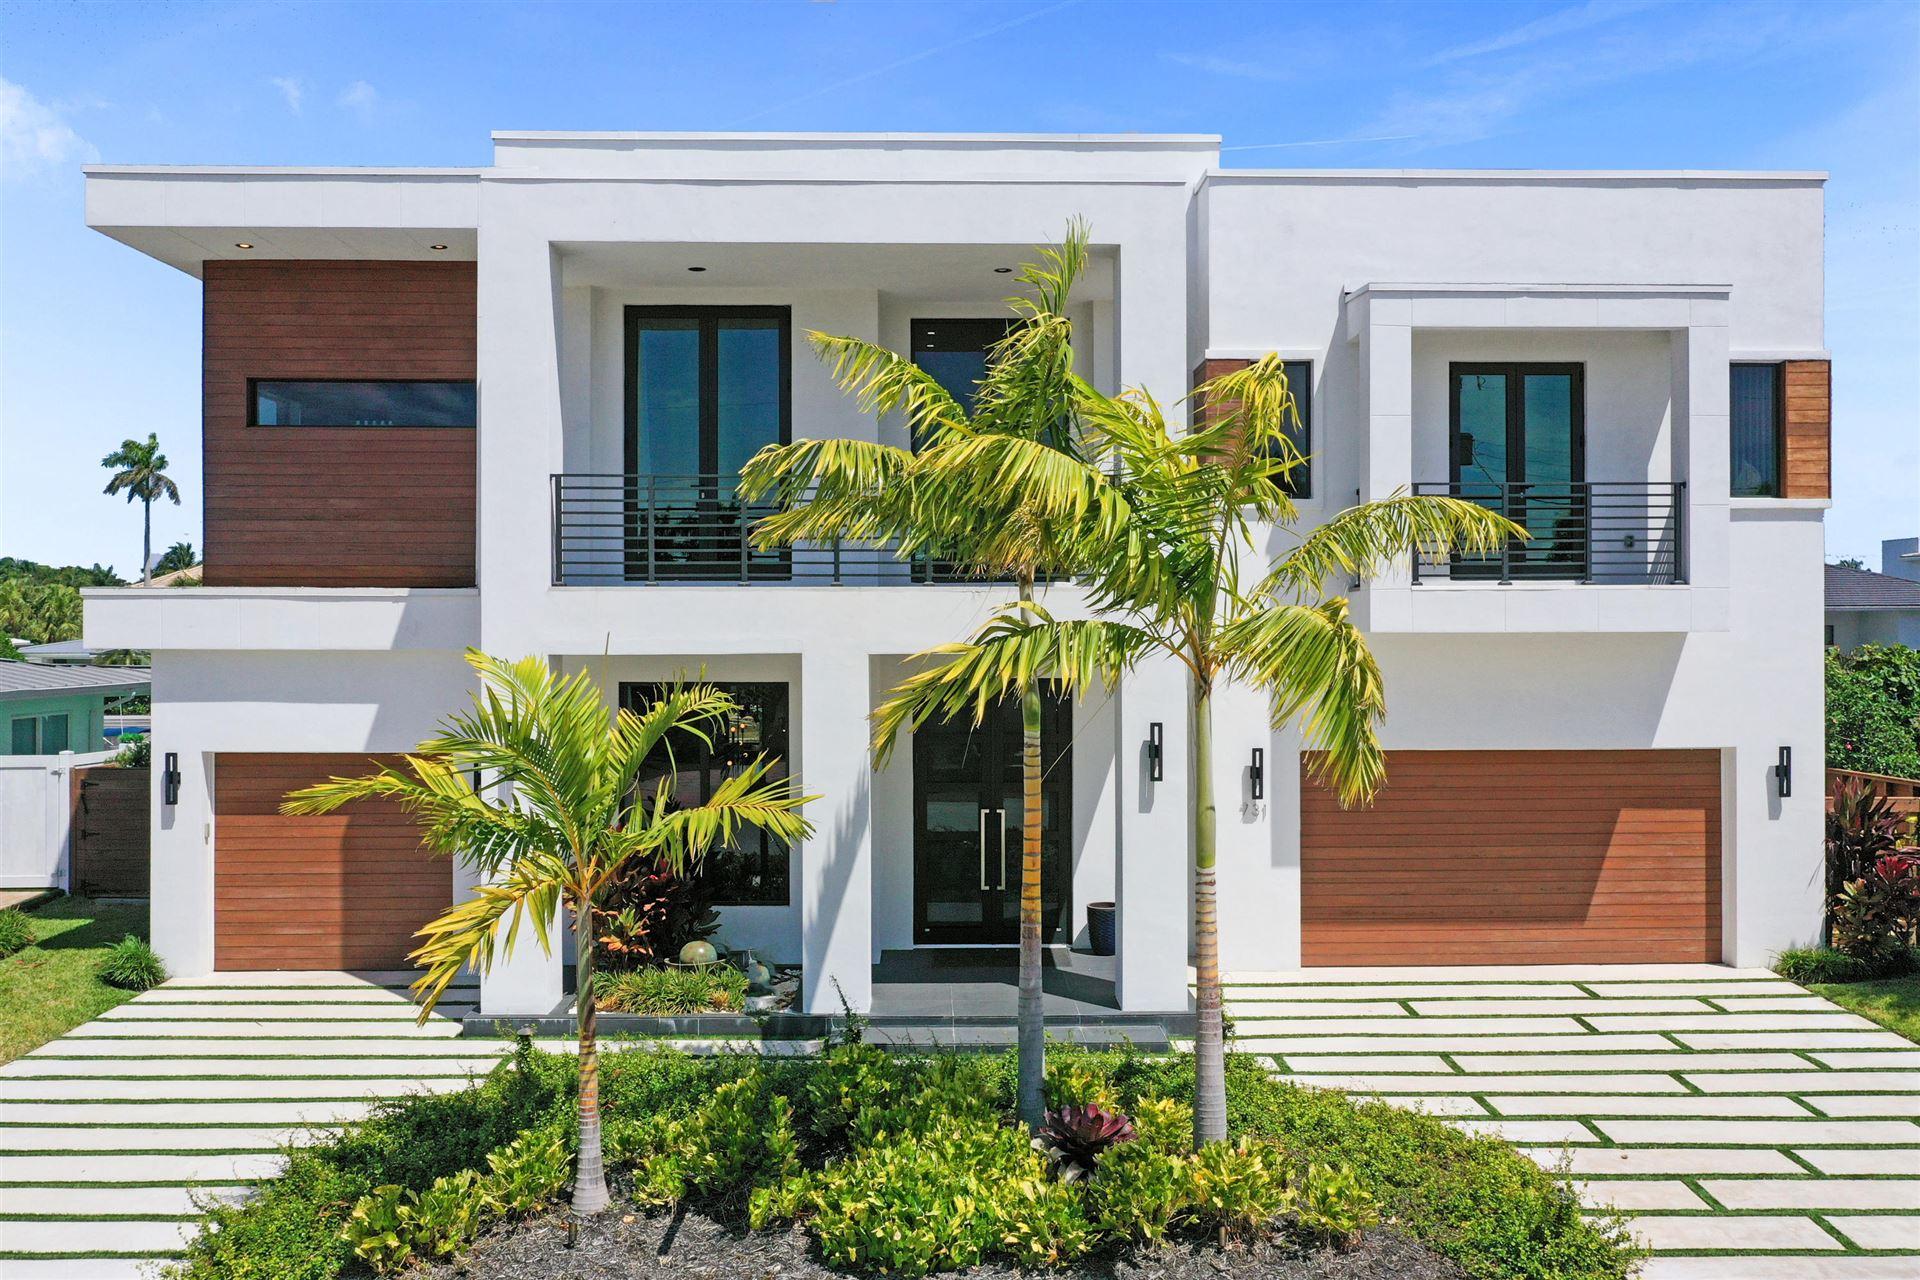 731 NE 69th Street, Boca Raton, FL 33487 - MLS#: RX-10707900